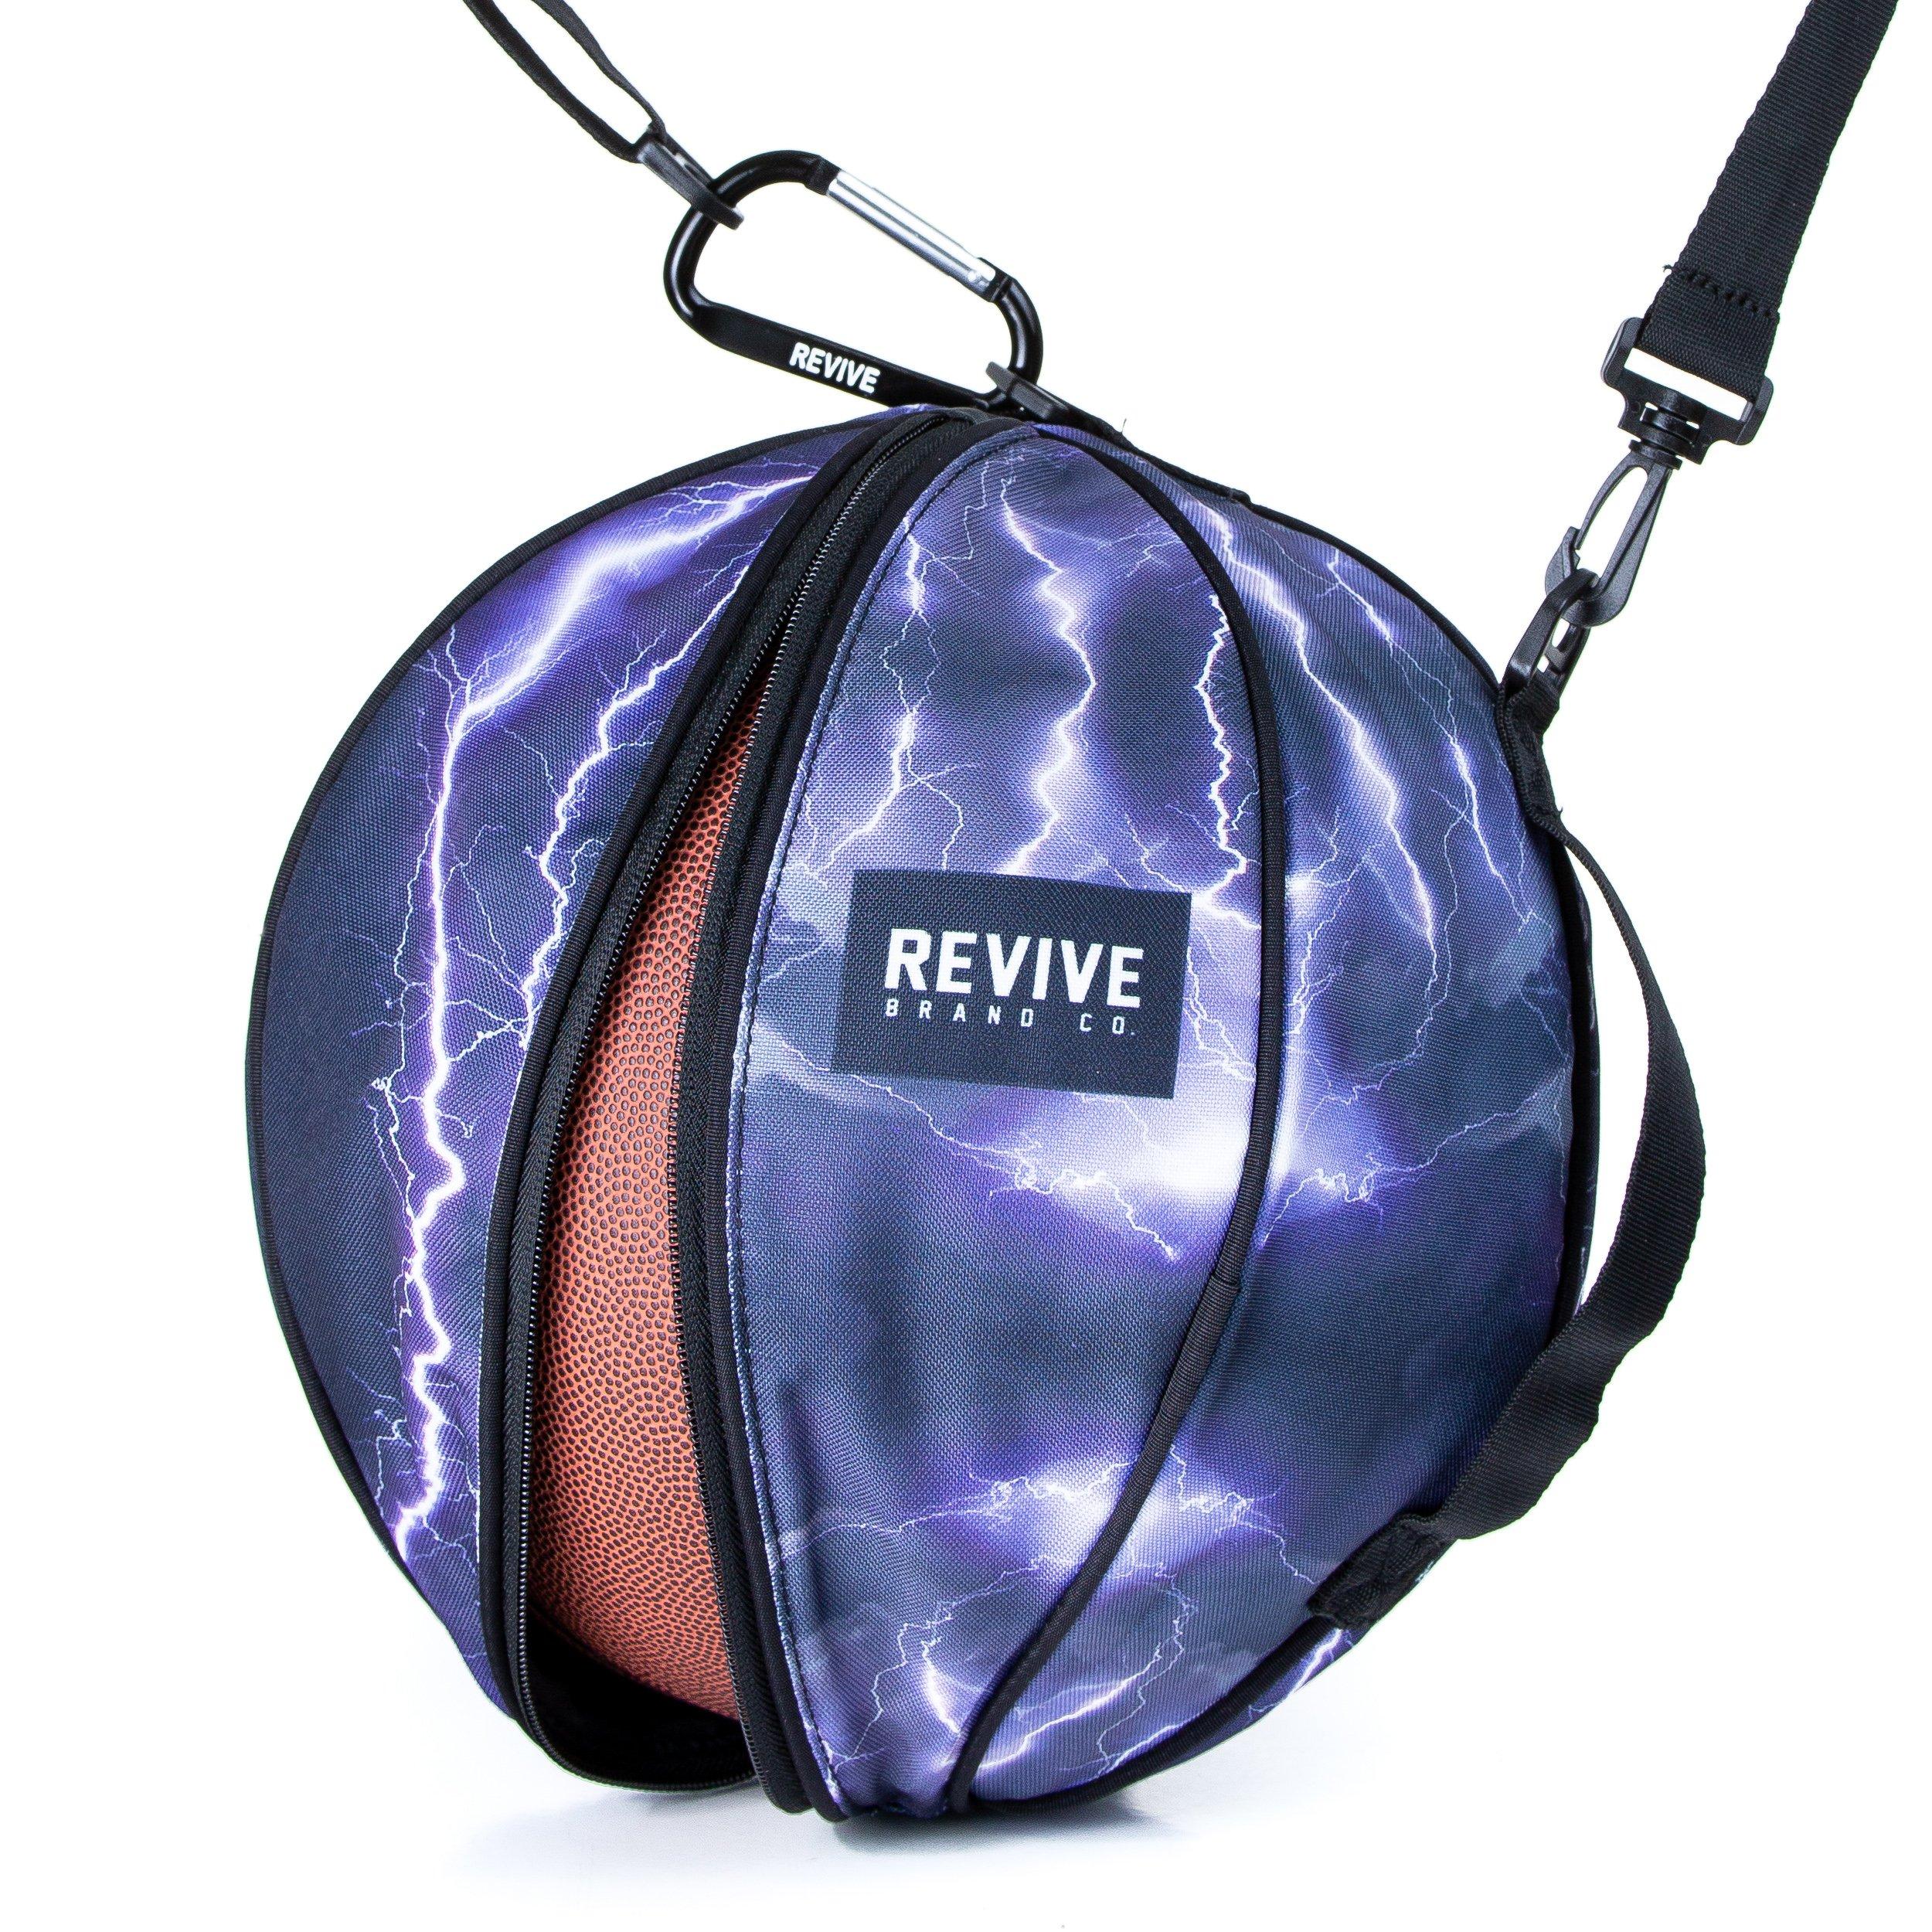 Revive Lightning Strike Game Bag Basketball Bag